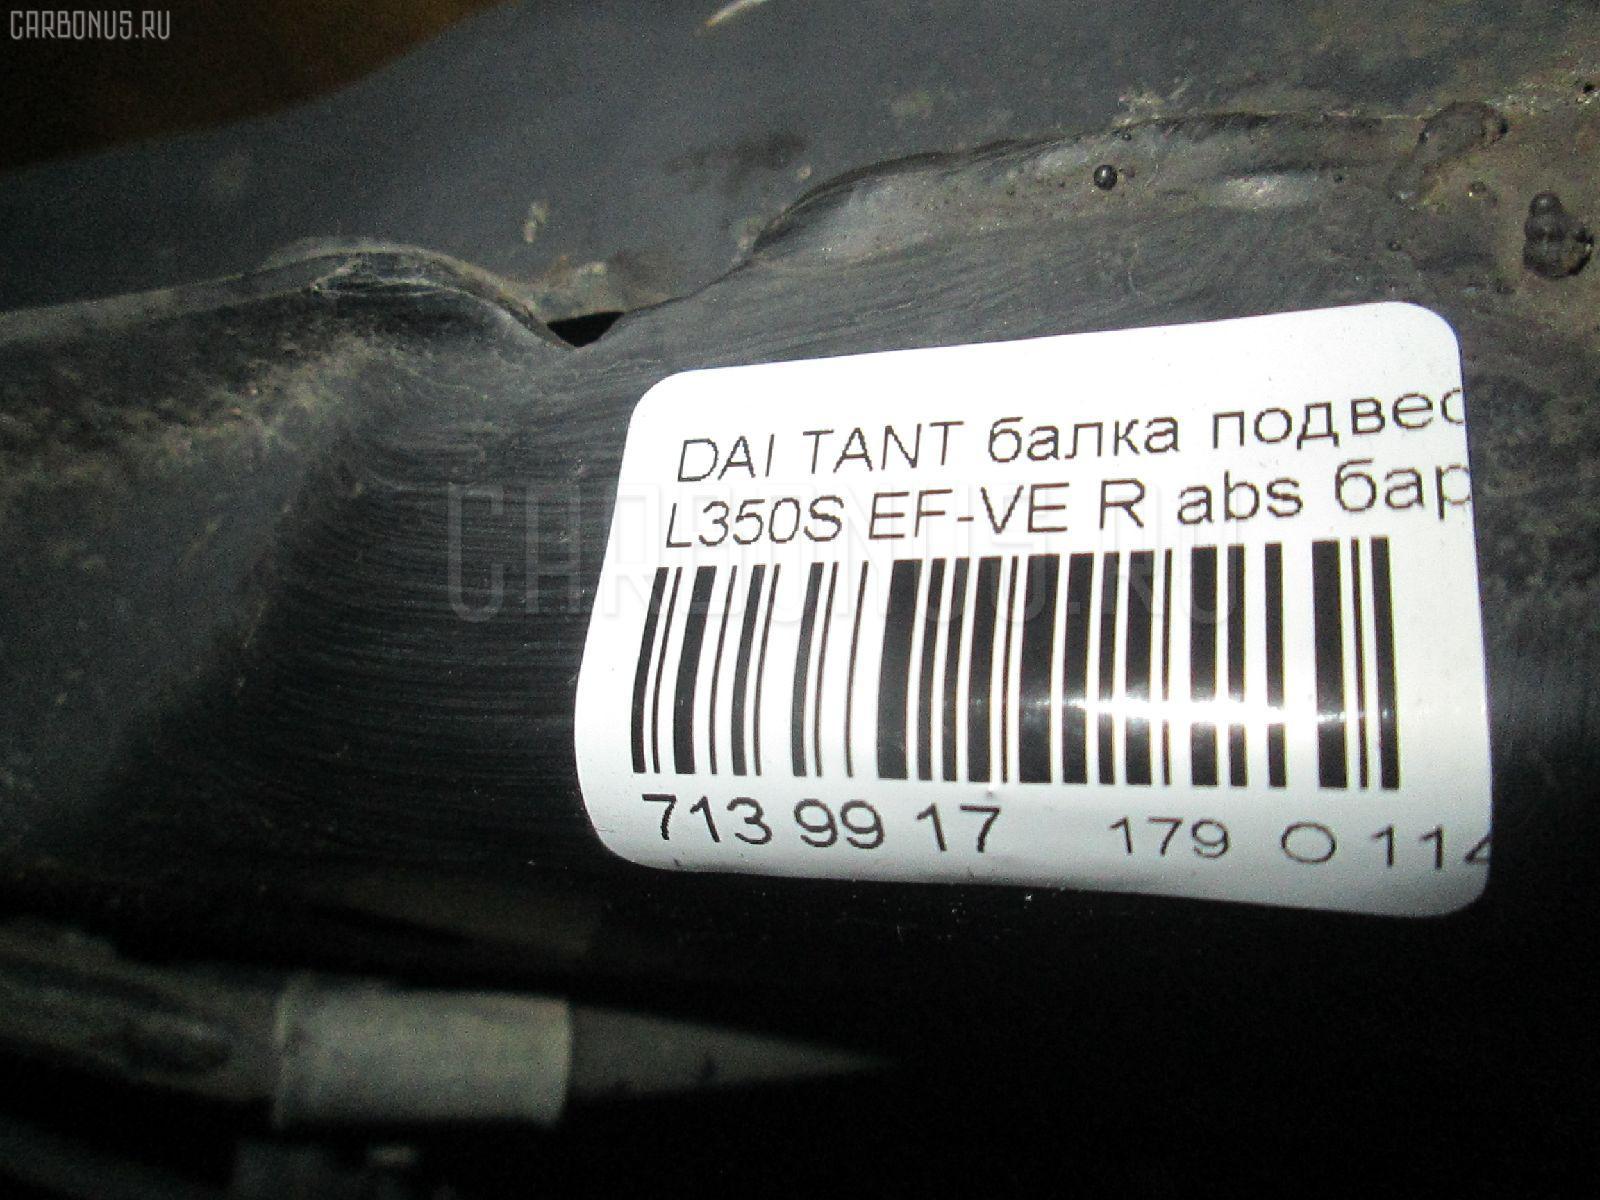 Балка подвески DAIHATSU TANTO L350S EF-VE Фото 4